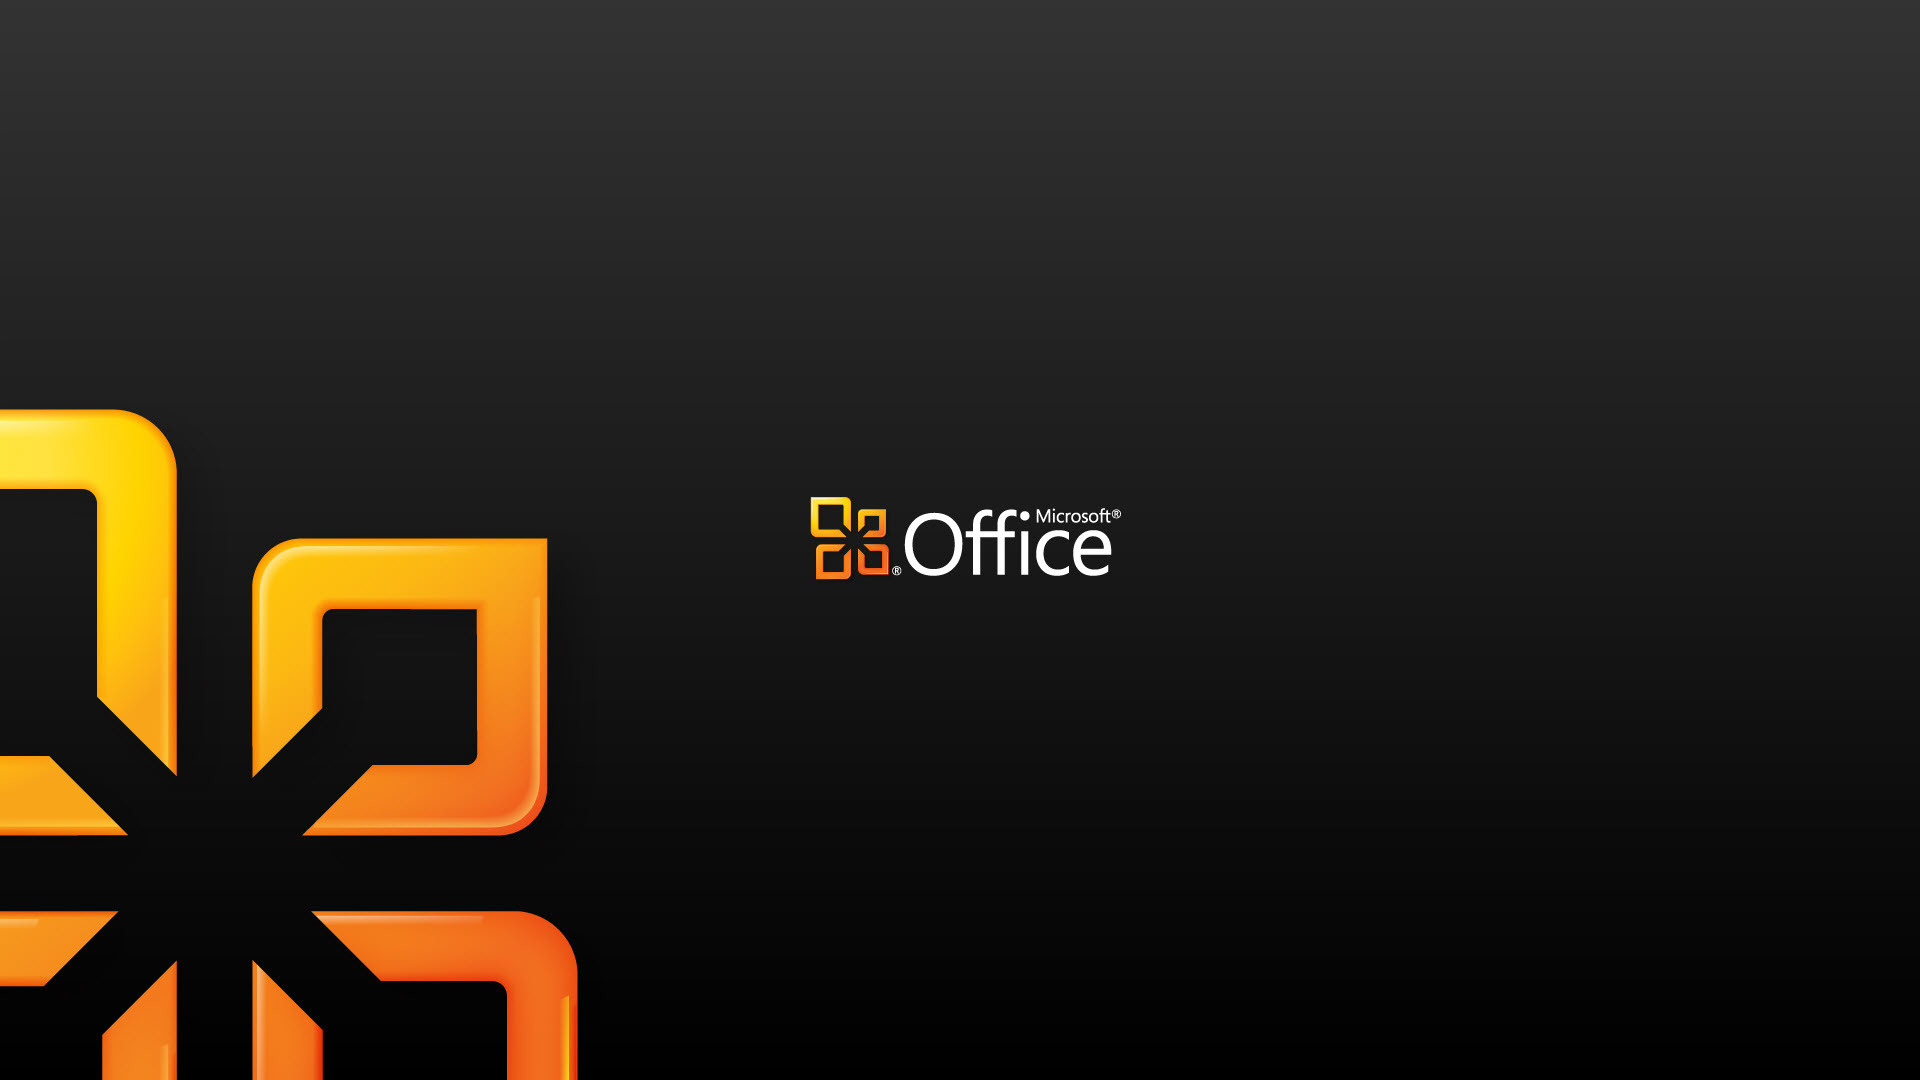 how to open a new desktop in windows 7